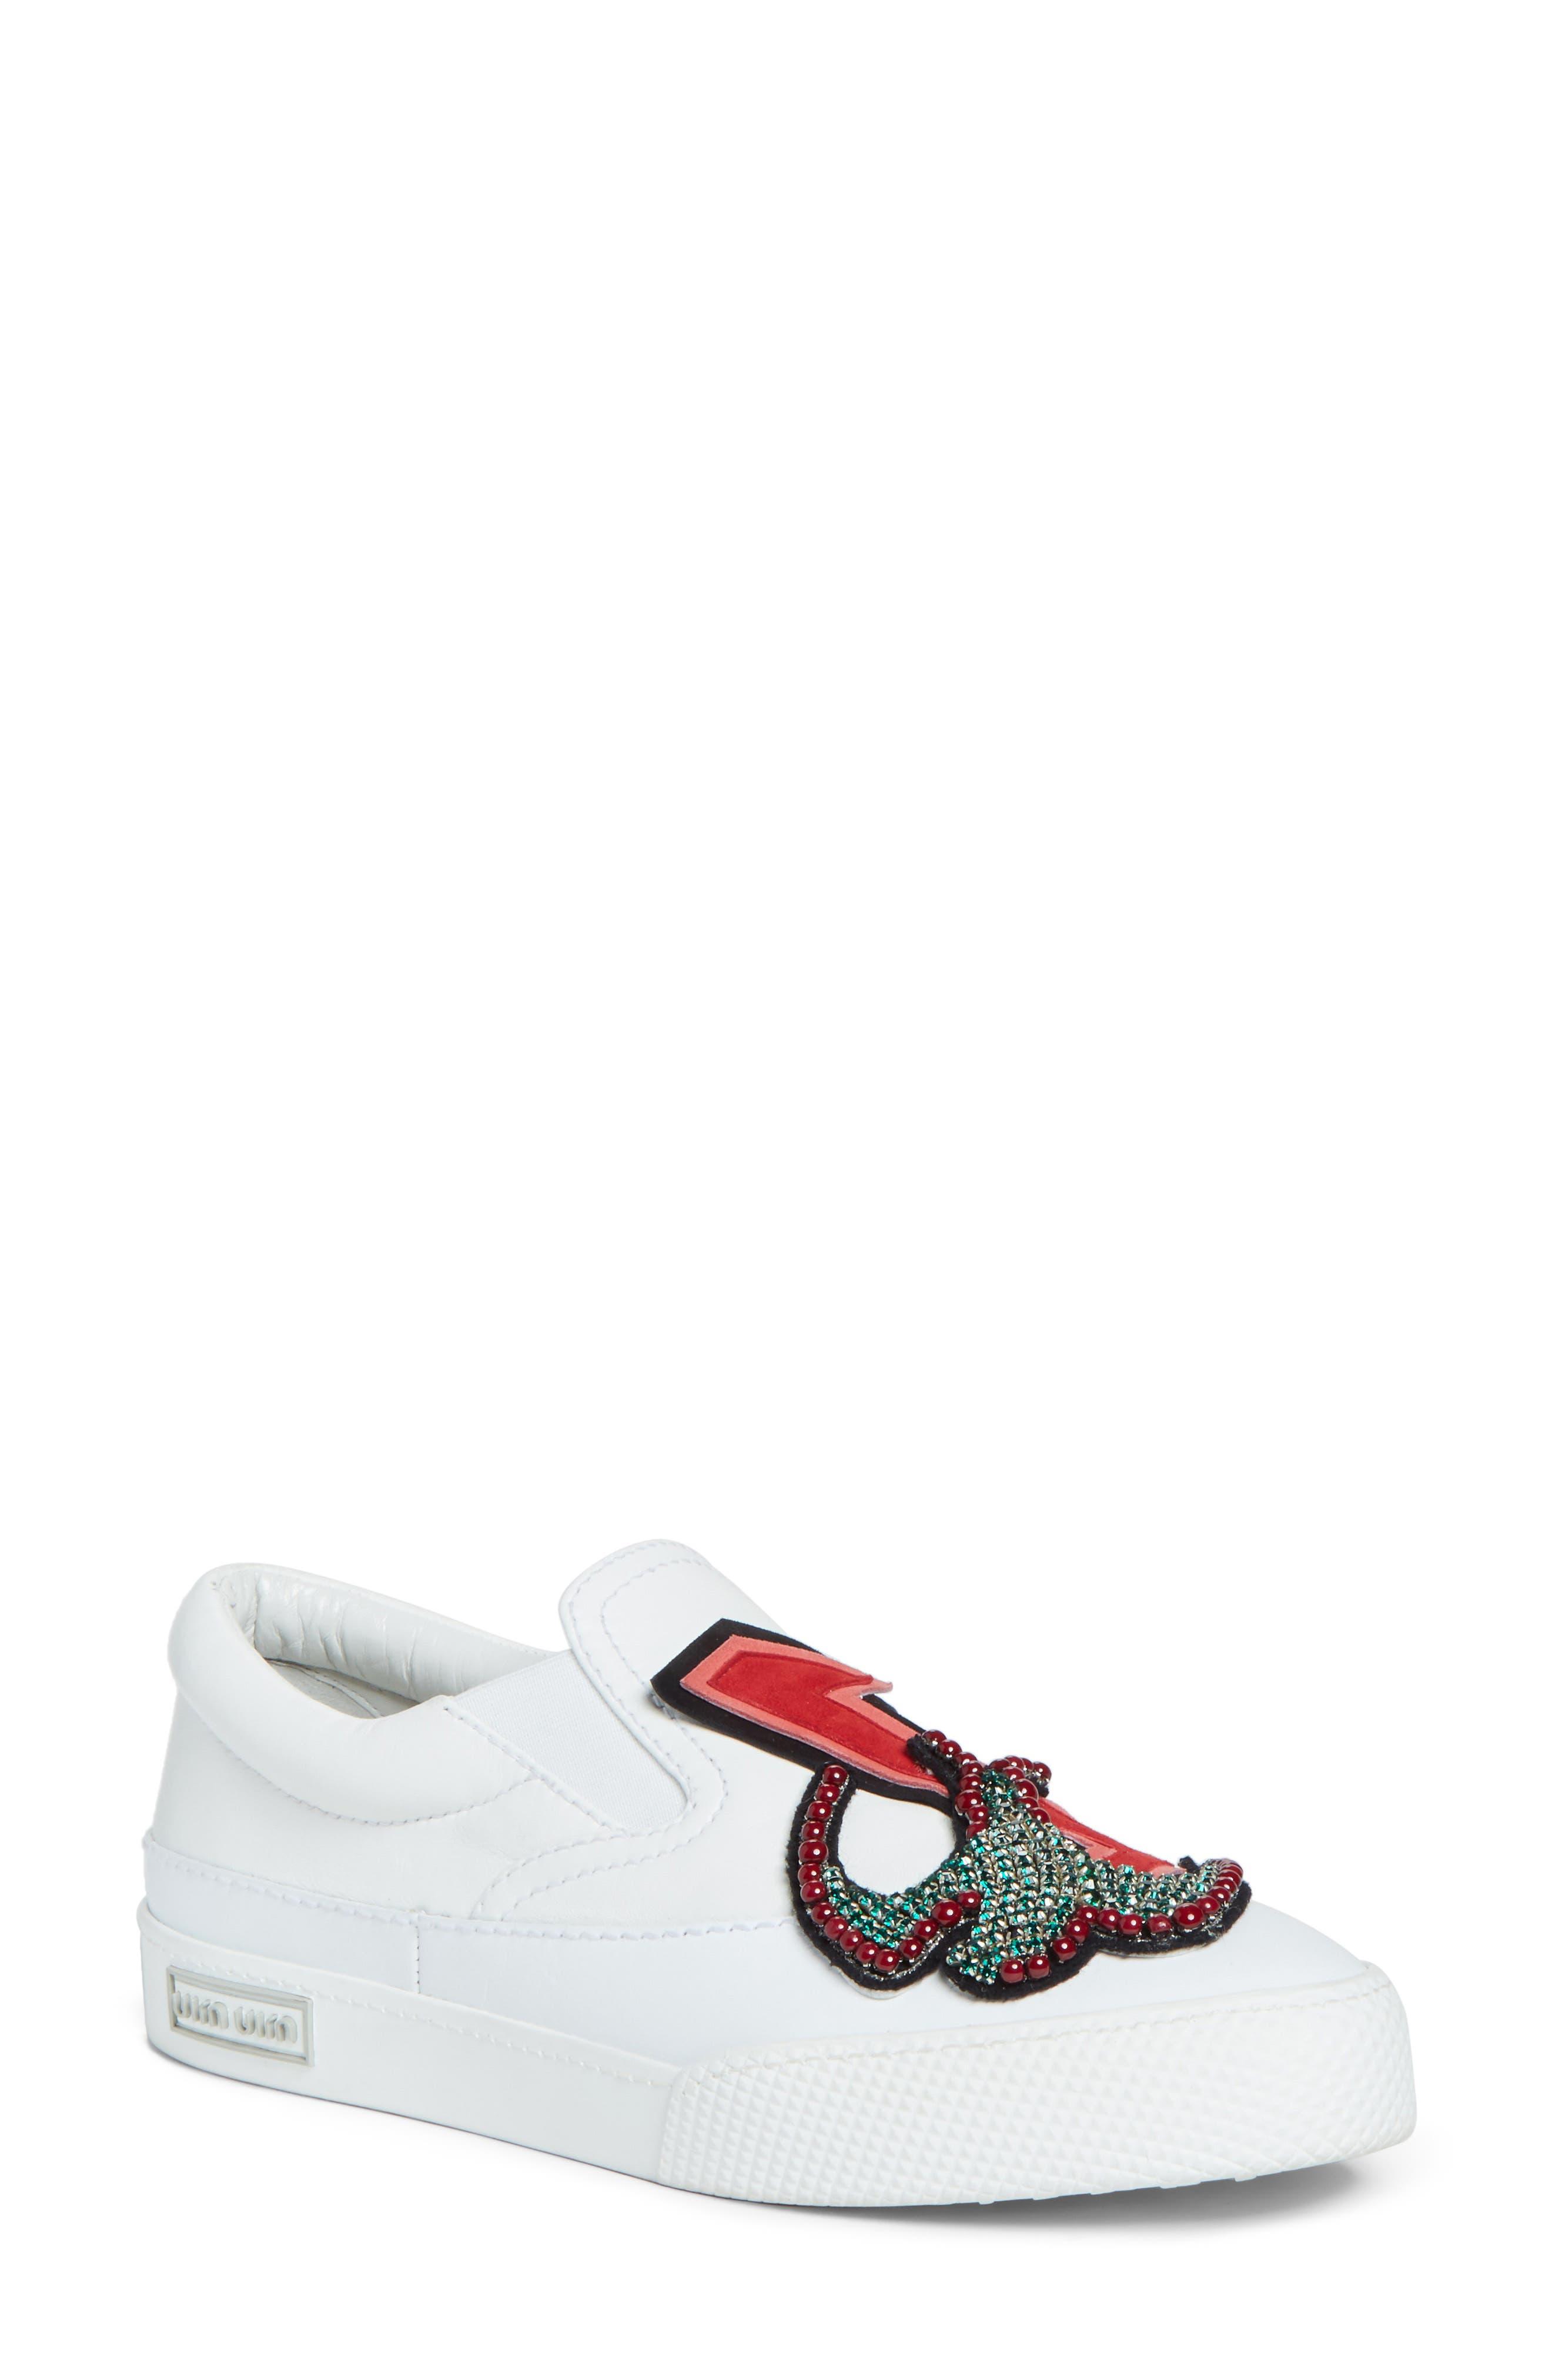 Miu Miu Embellished Slip-On Sneaker (Women)